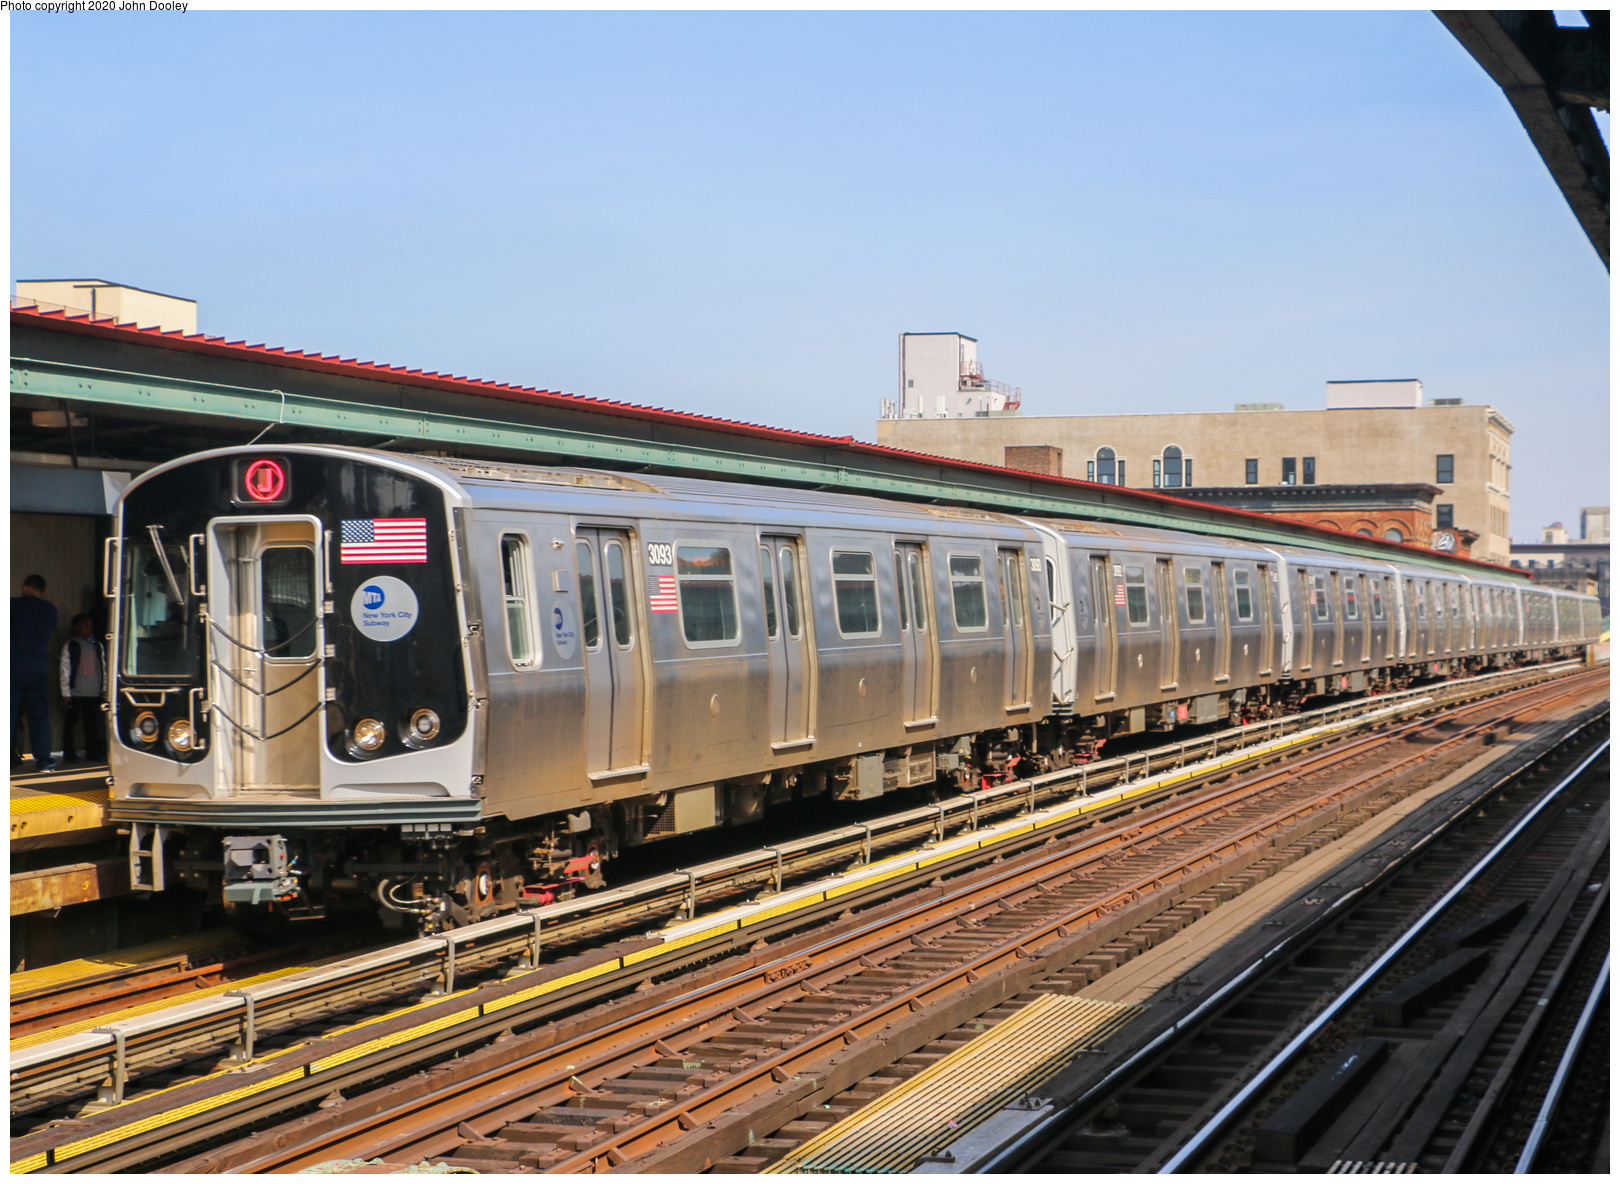 (833k, 1620x1184)<br><b>Country:</b> United States<br><b>City:</b> New York<br><b>System:</b> New York City Transit<br><b>Line:</b> BMT Nassau Street-Jamaica Line<br><b>Location:</b> Flushing Avenue<br><b>Route:</b> J<br><b>Car:</b> R-179 (Bombardier, 2016-2019) 3093 <br><b>Photo by:</b> John Dooley<br><b>Date:</b> 5/14/2018<br><b>Viewed (this week/total):</b> 3 / 379